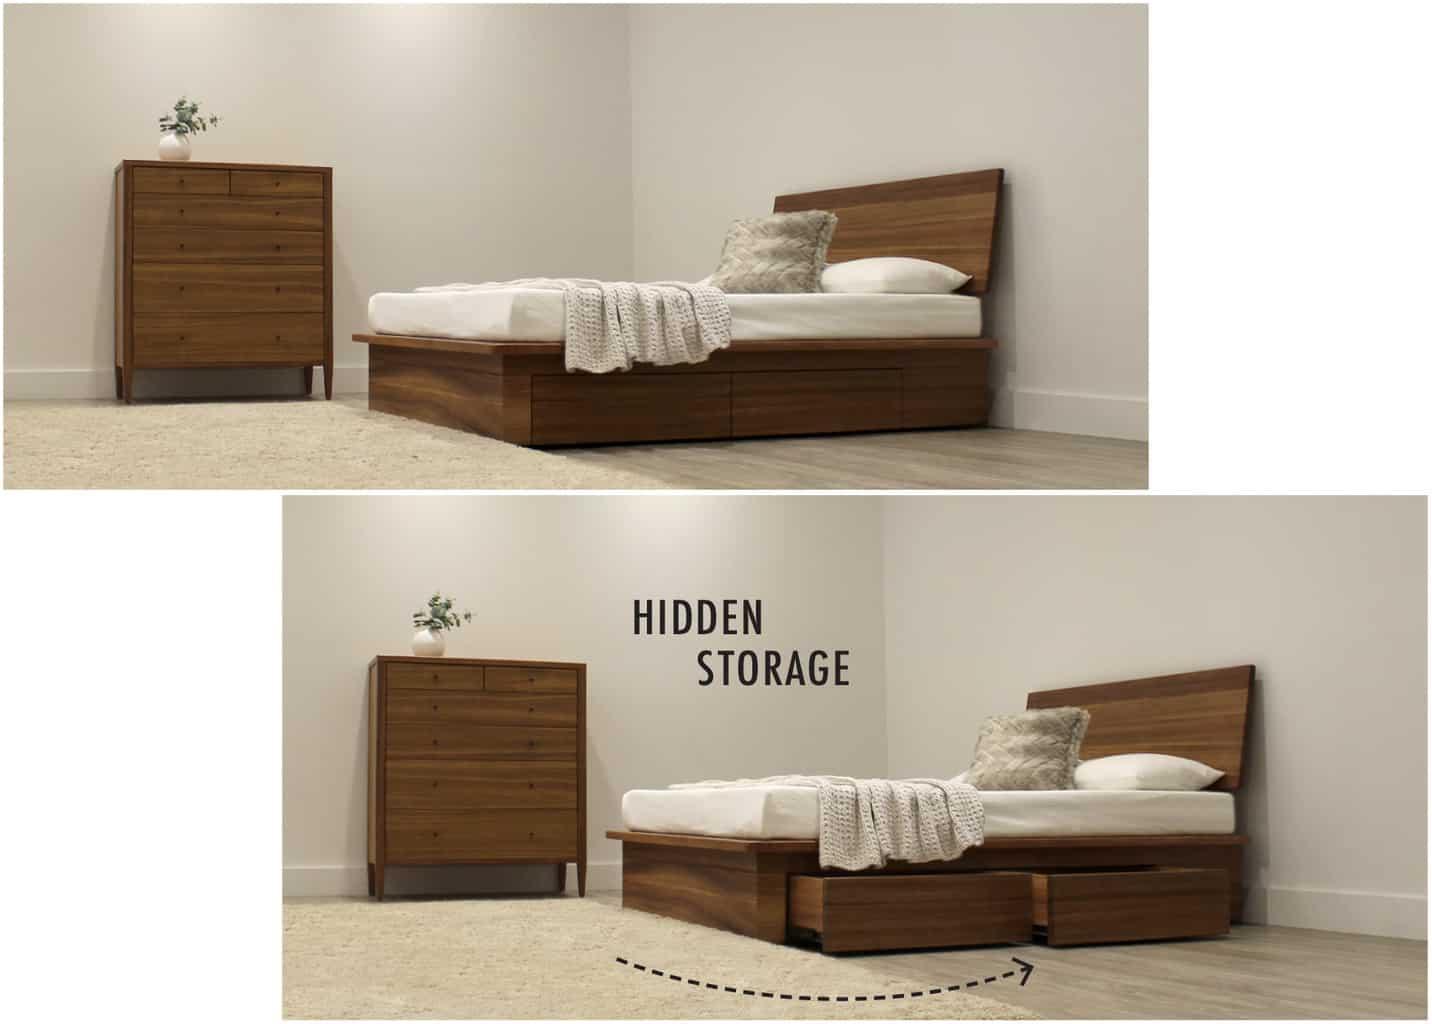 Bedroom Furniture Made for You - Nordic Design